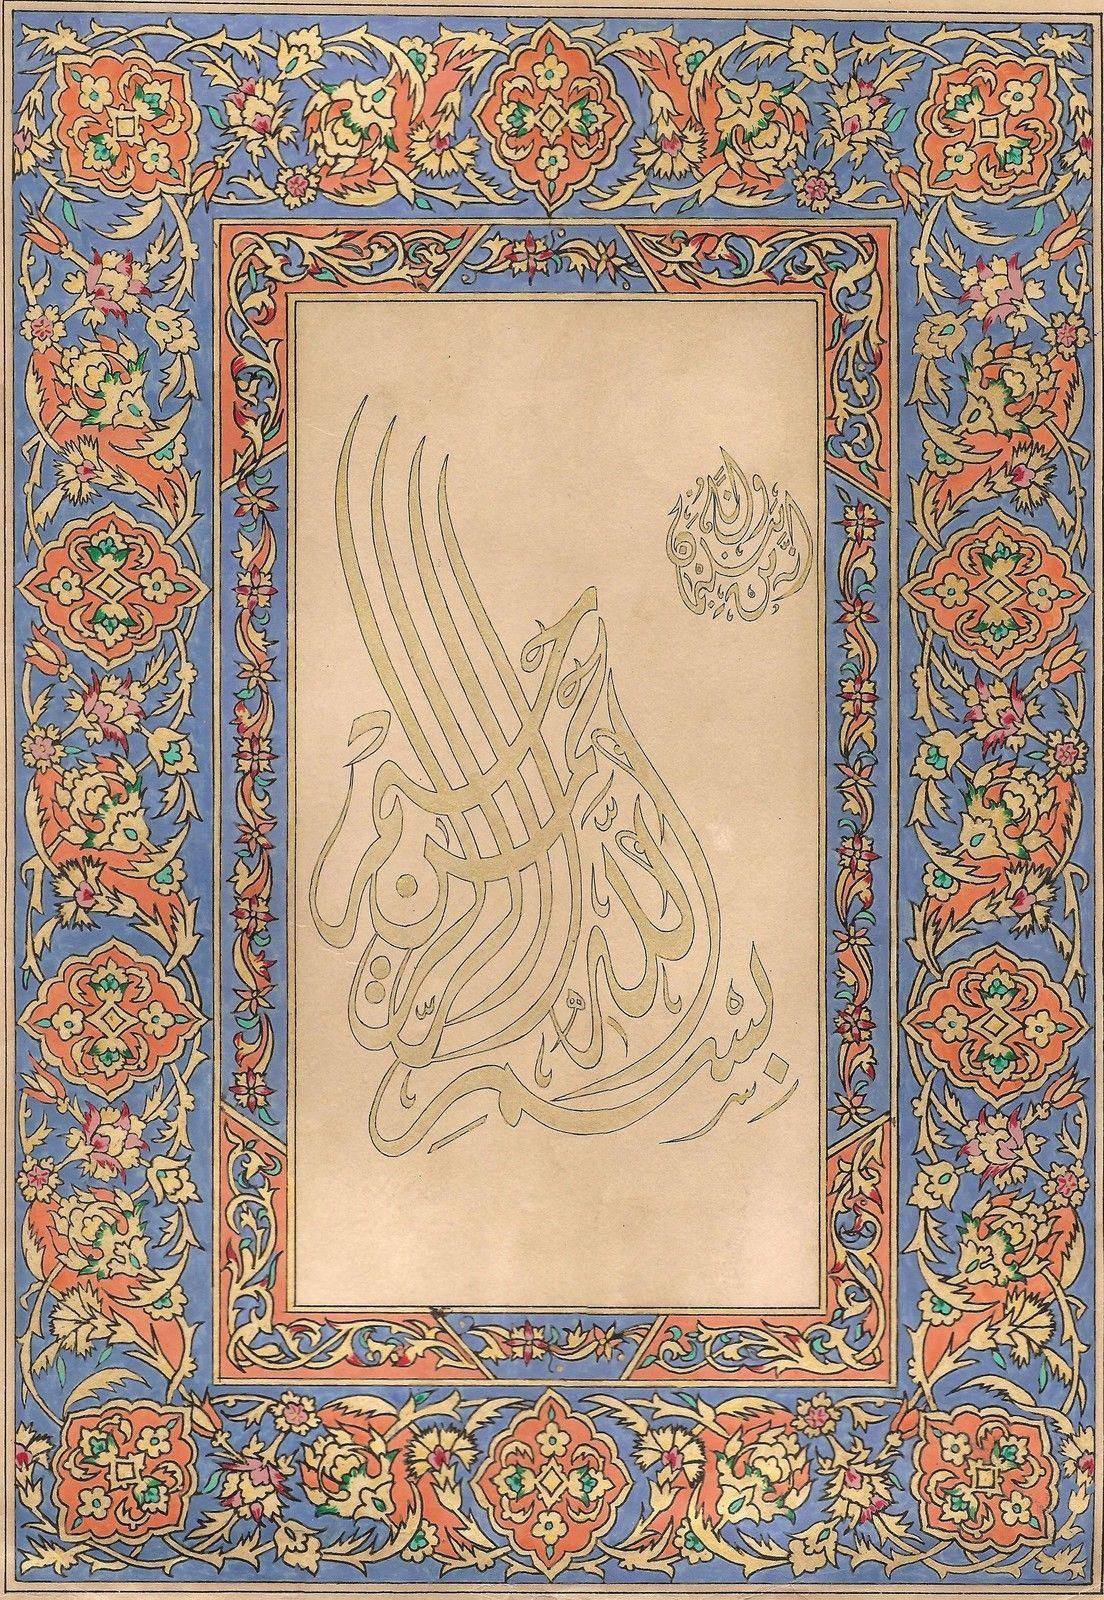 Islamic Koran Calligraphy Art Handmade Quran Floral Motif Decor Paper Painting